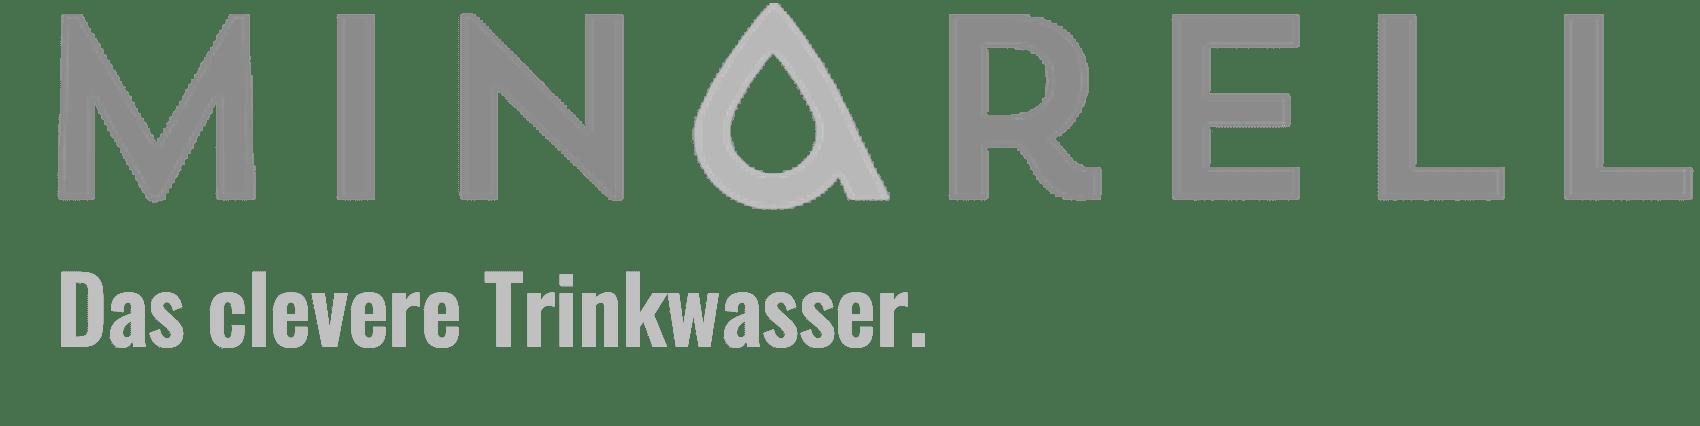 MINARELL Premium Wasser Logo Claim Grau